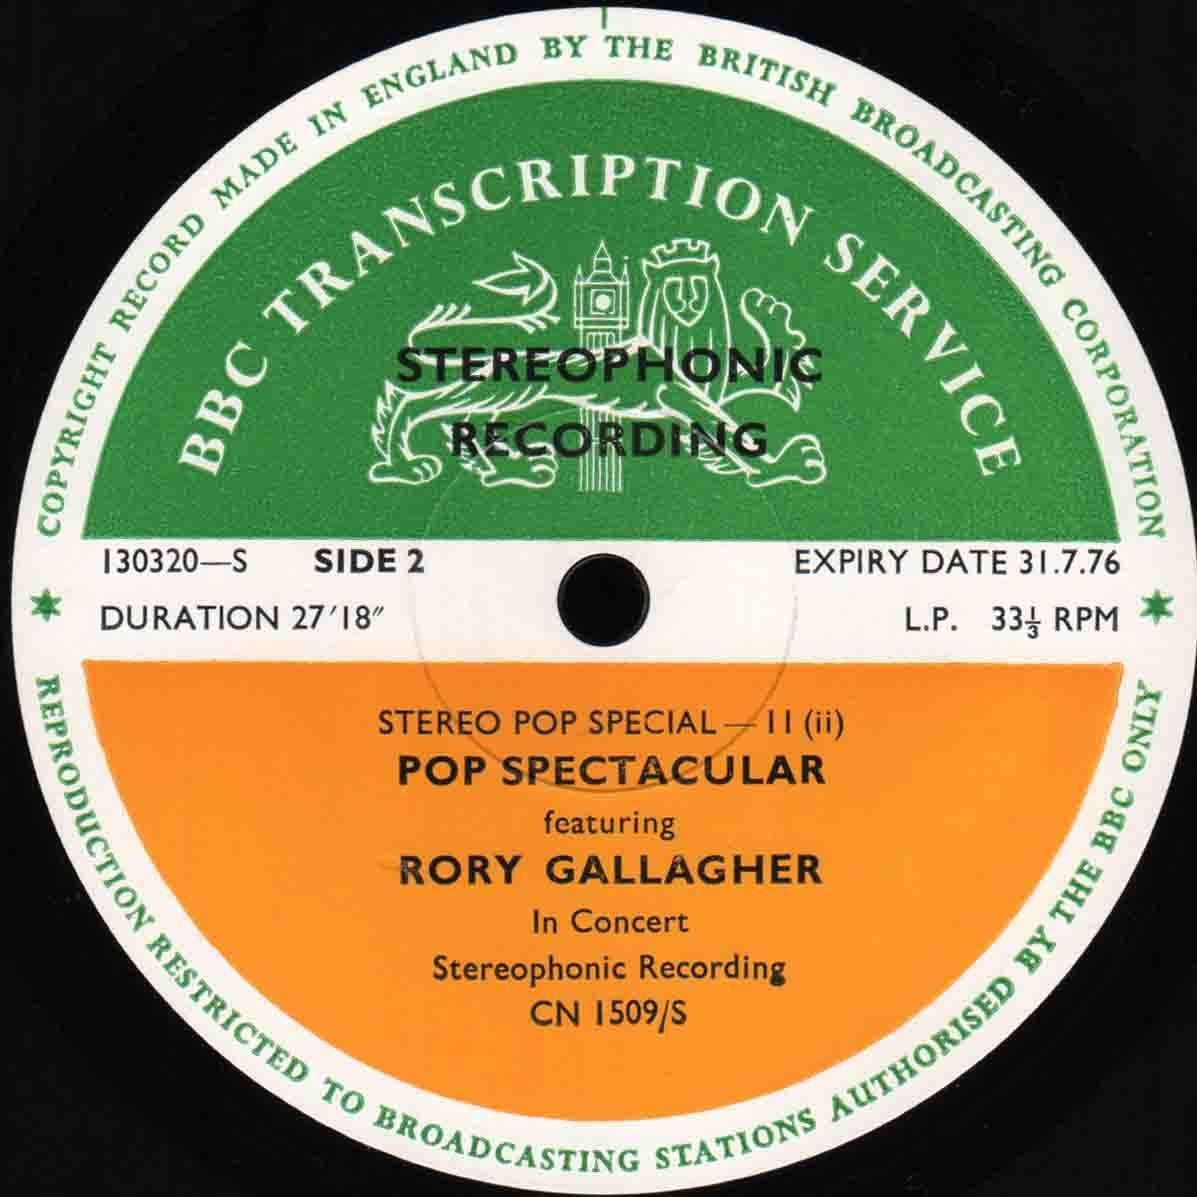 RoryGallagher1972-01-13ParisTheatreLondonUK.JPG